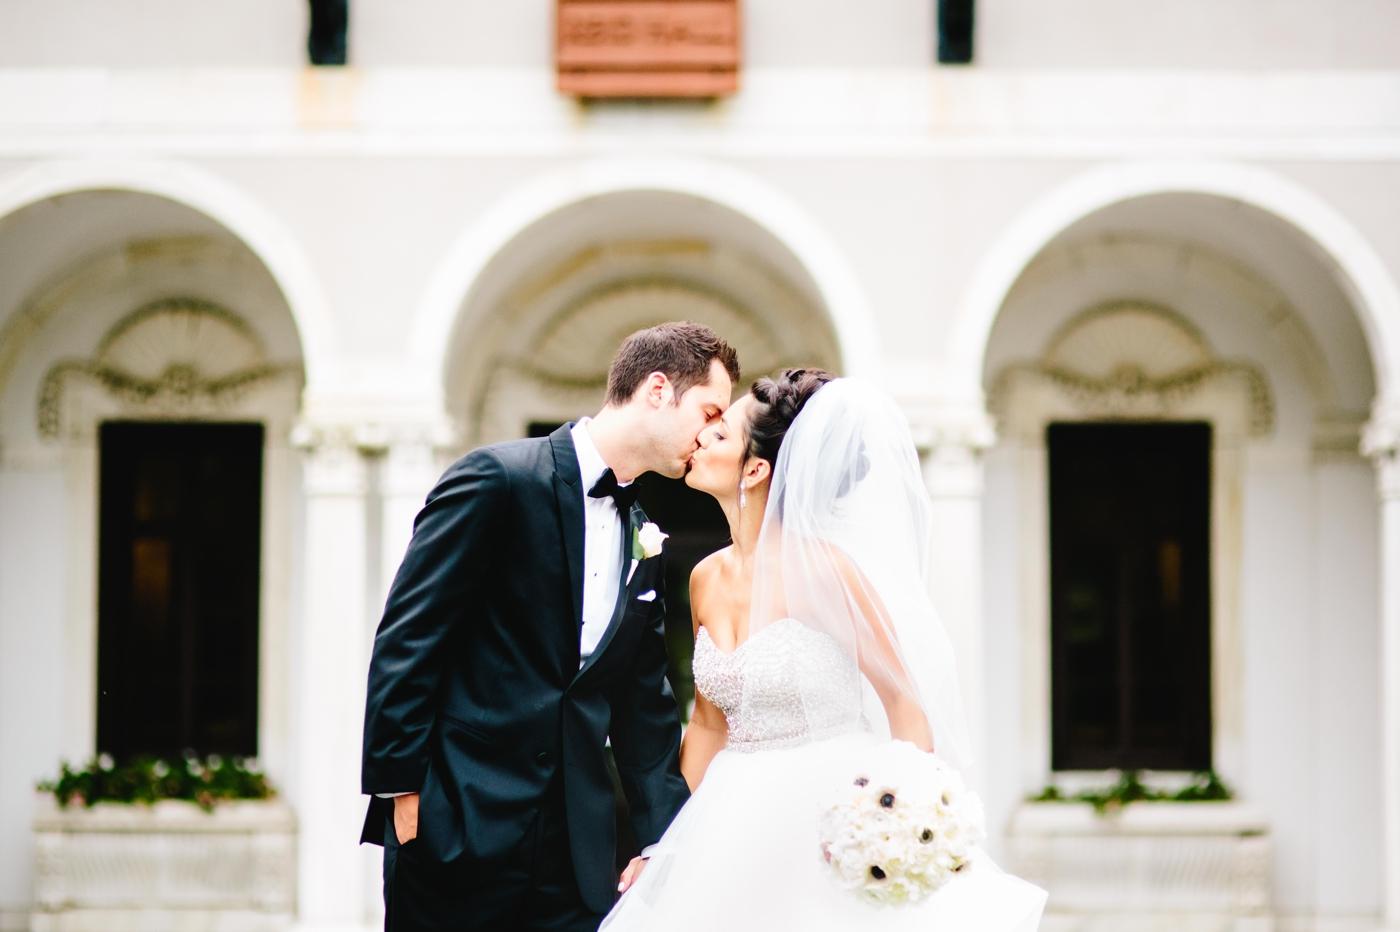 chicago-fine-art-wedding-photography-smeja41